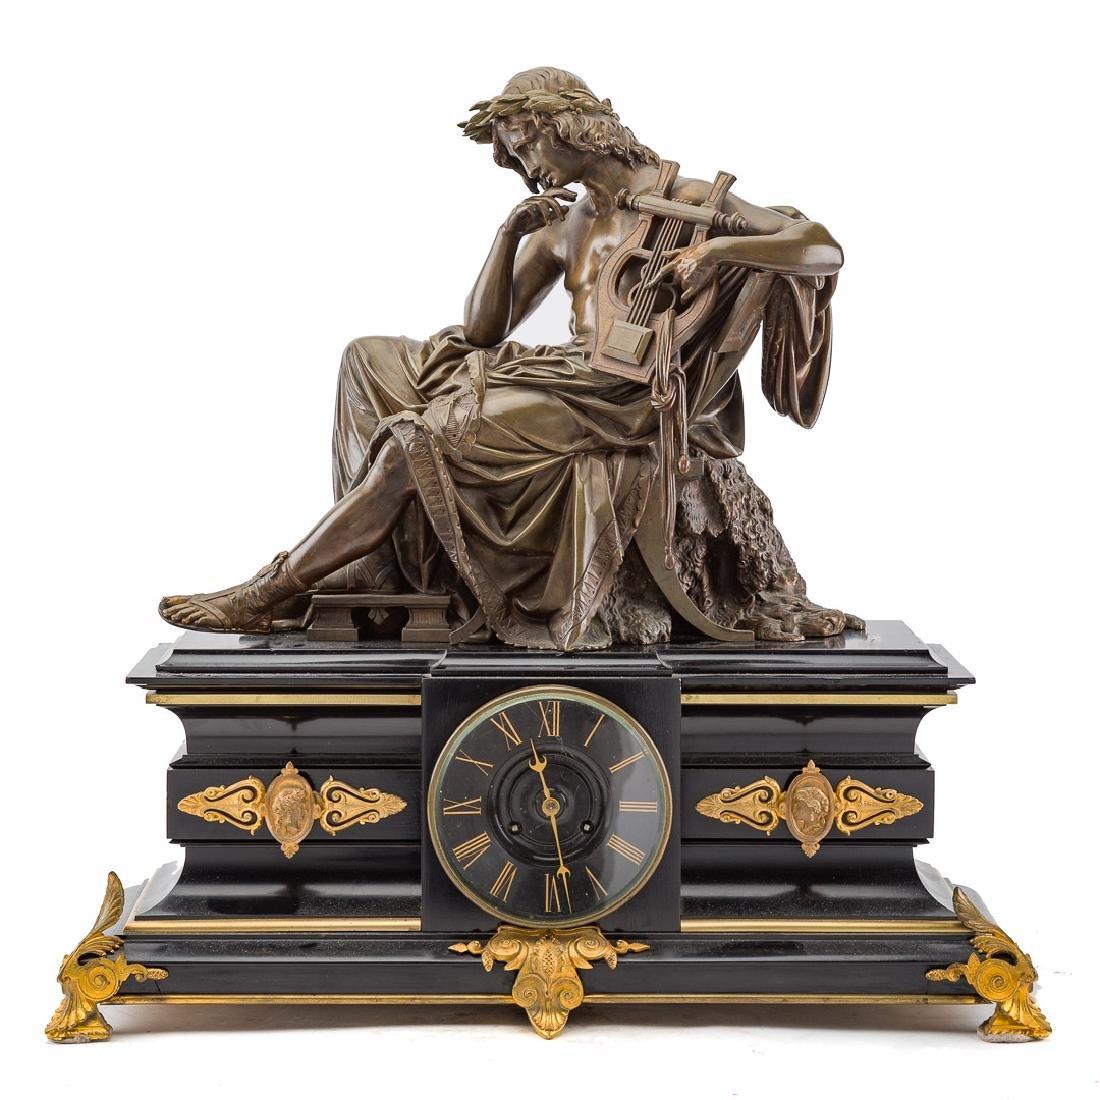 Alfred Carrier-Belleuse. Apollo figural clock